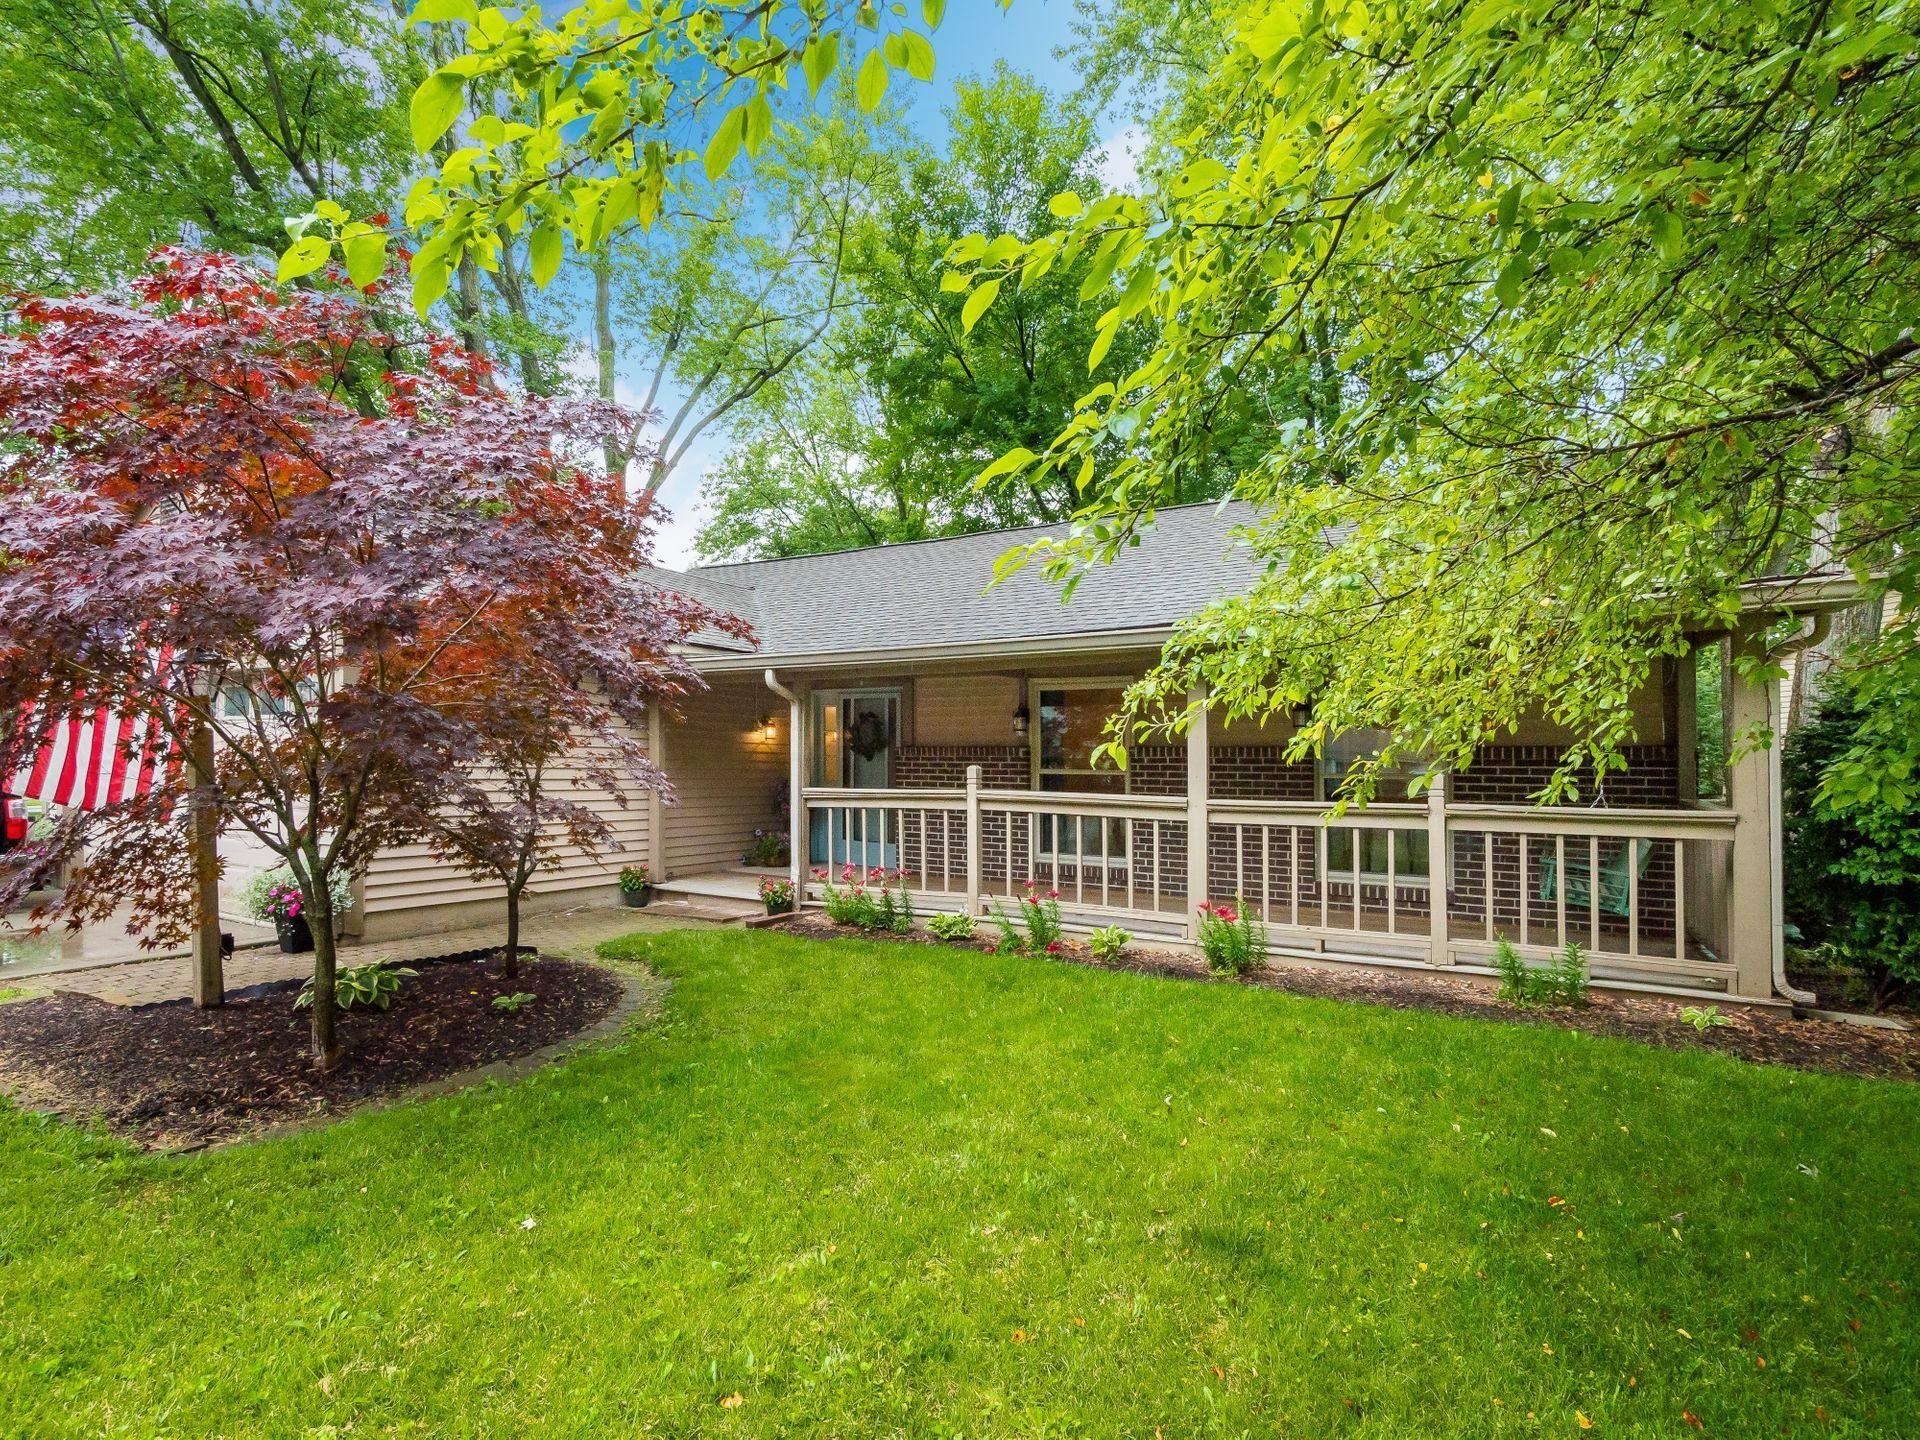 Photo of 3942 Bluebird Court, Westerville, OH 43081 (MLS # 221022096)